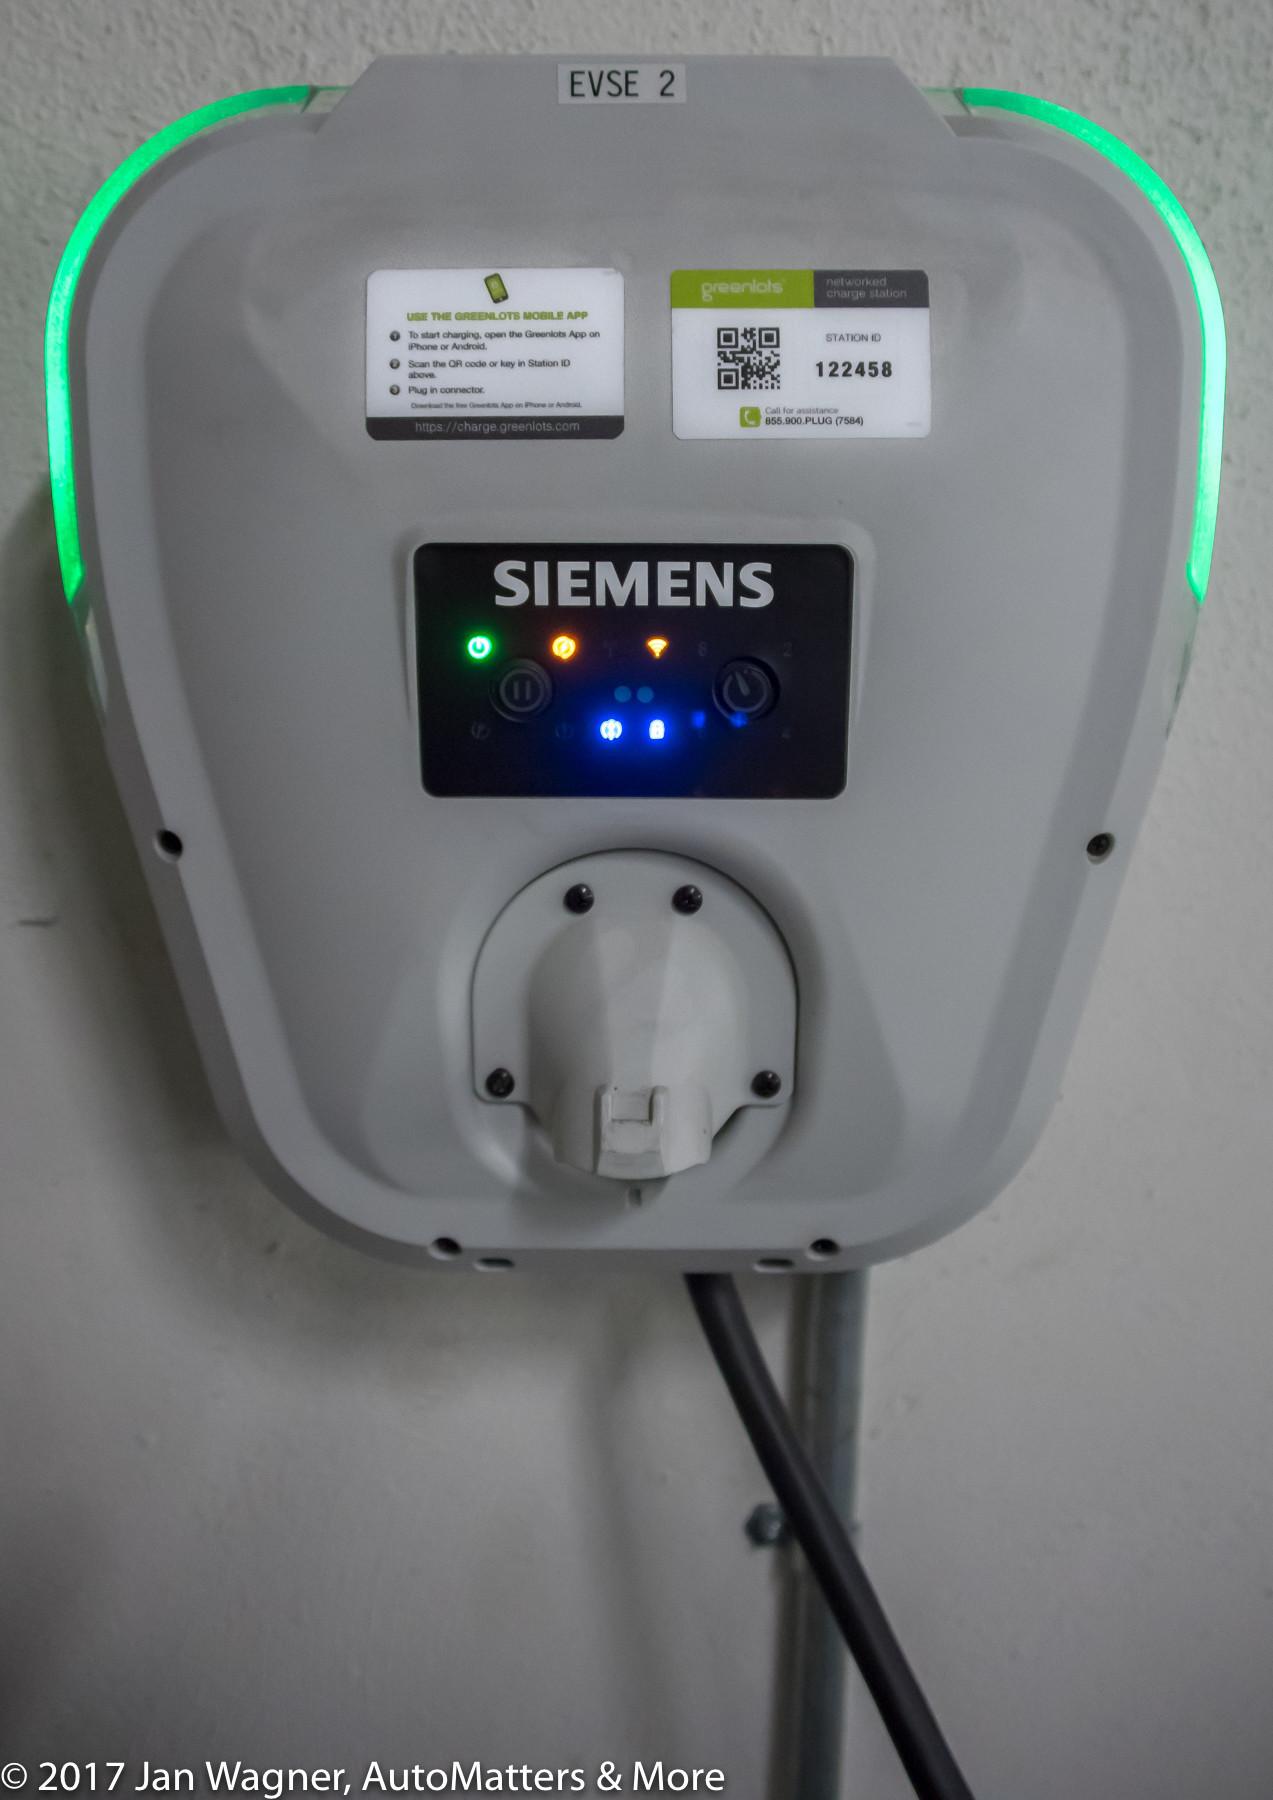 Public charger